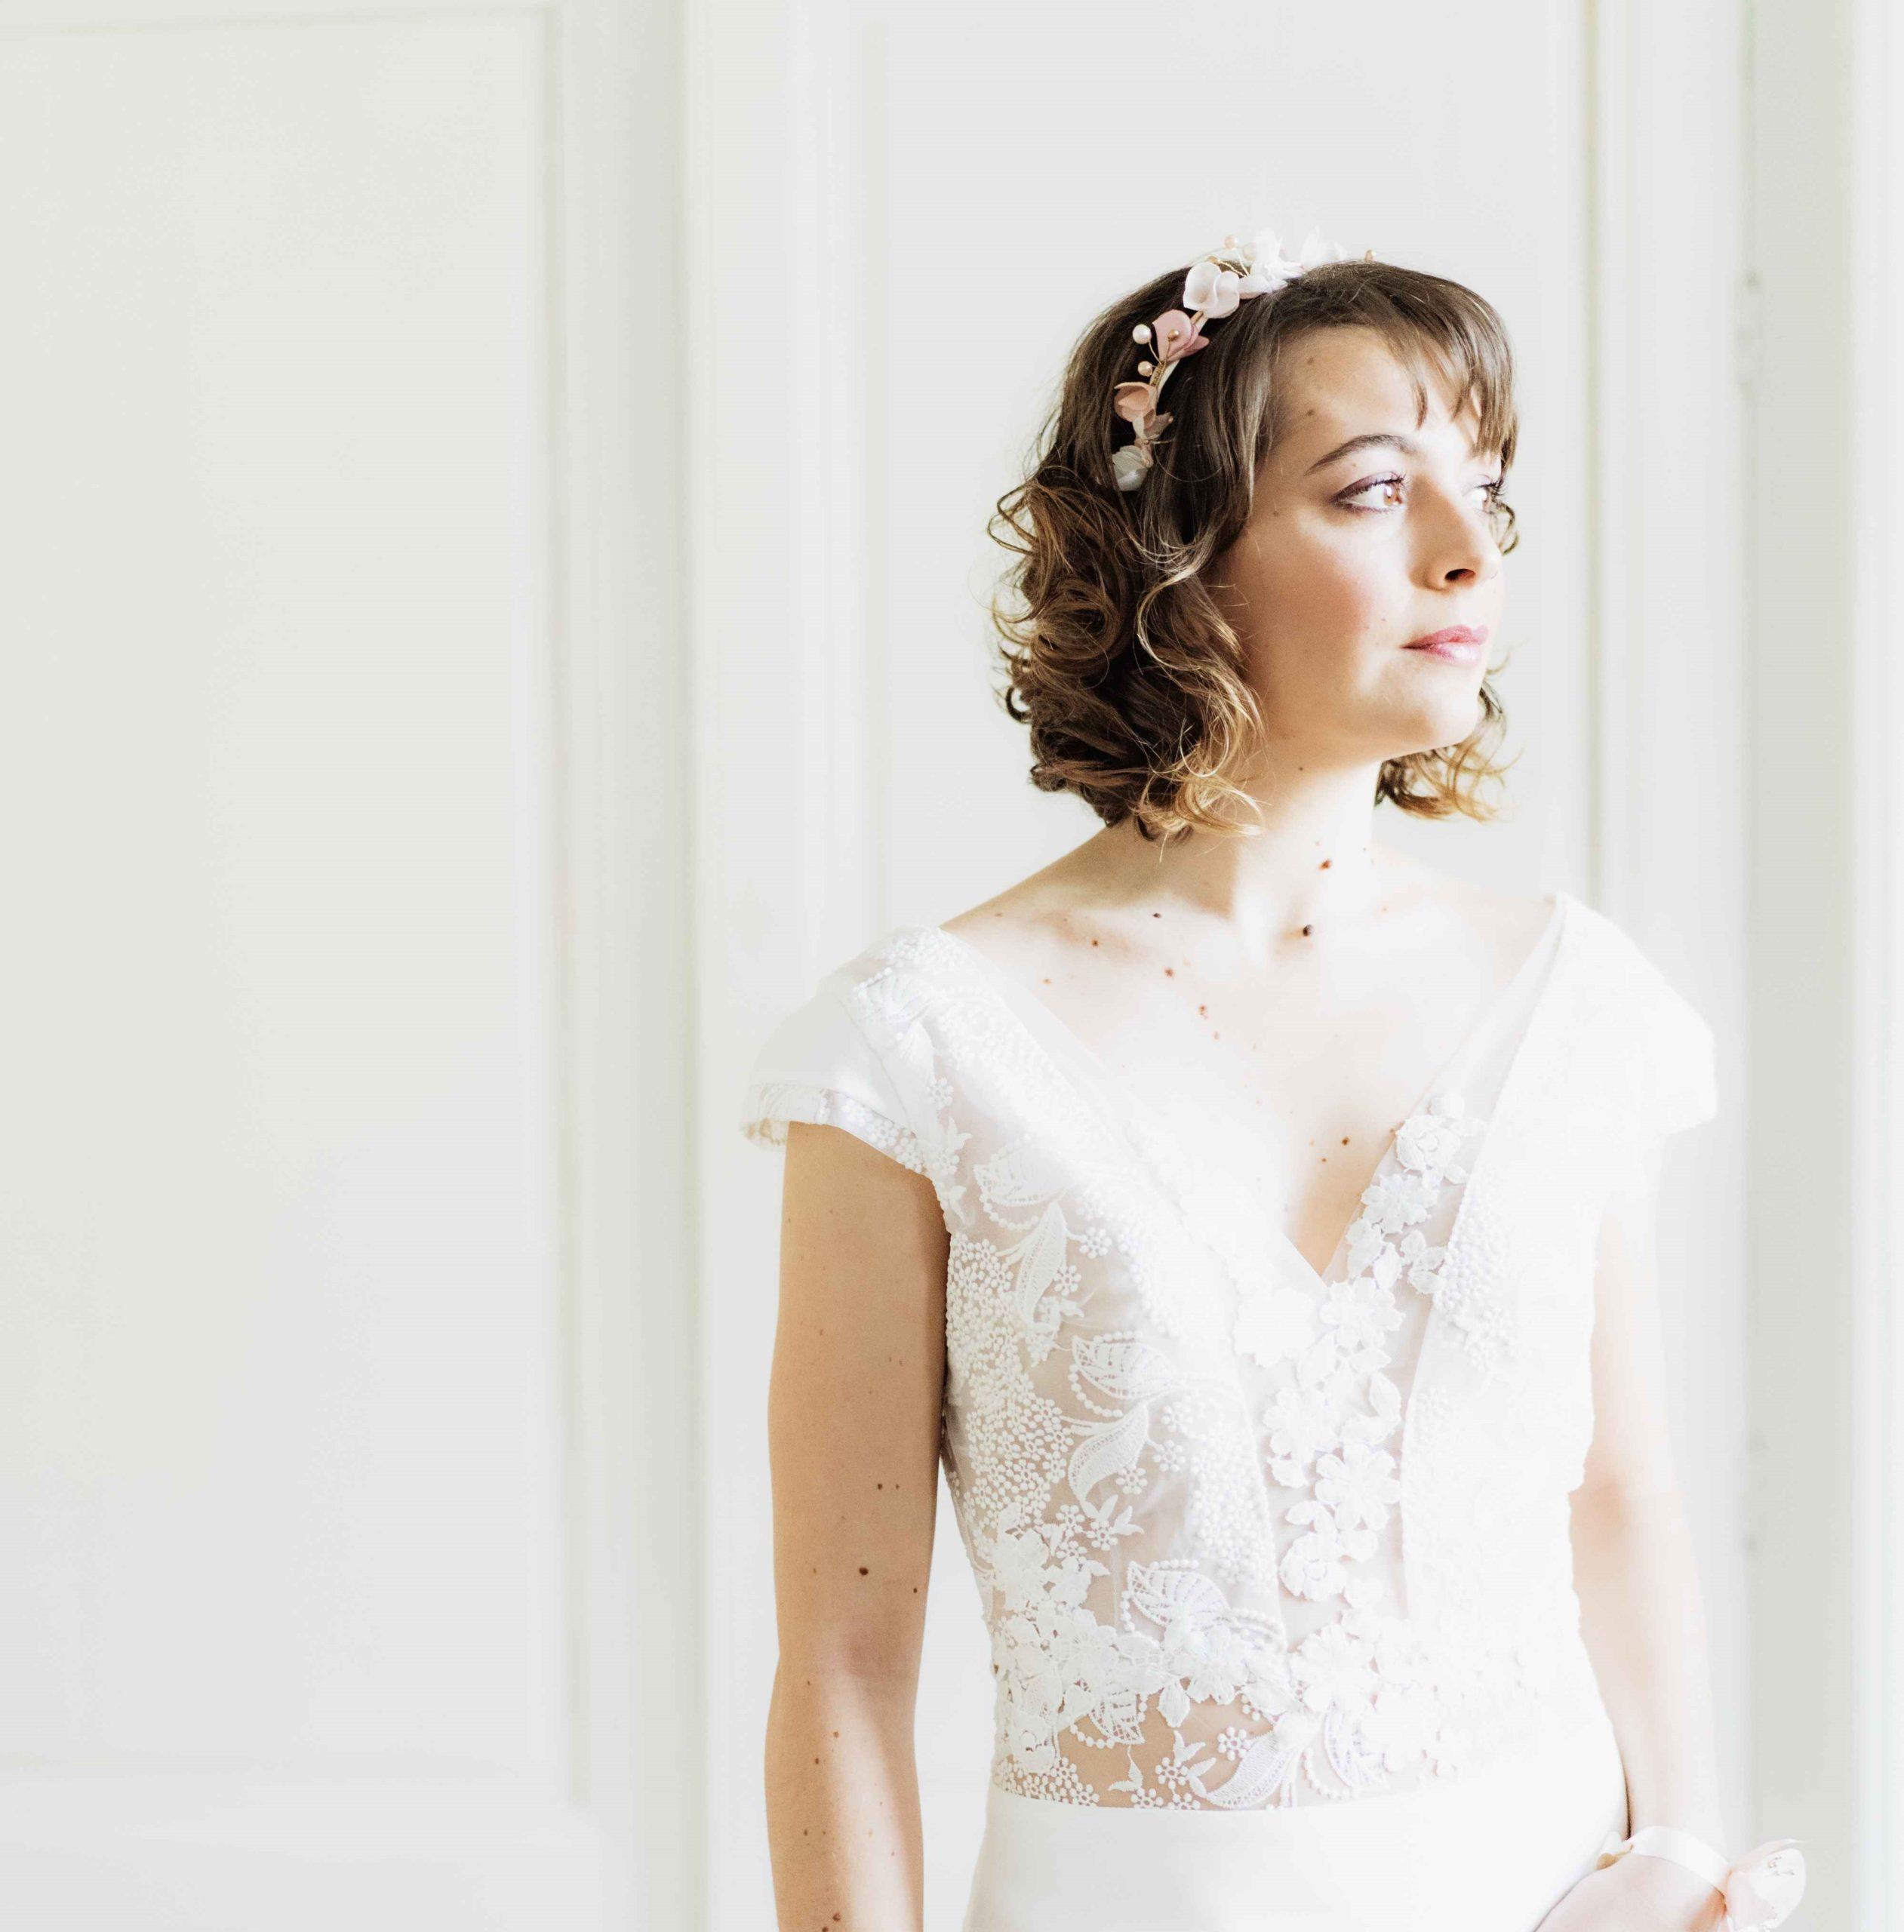 Couronne Bertille 2 Alice Marty - Couture florale Accessoires Mariage